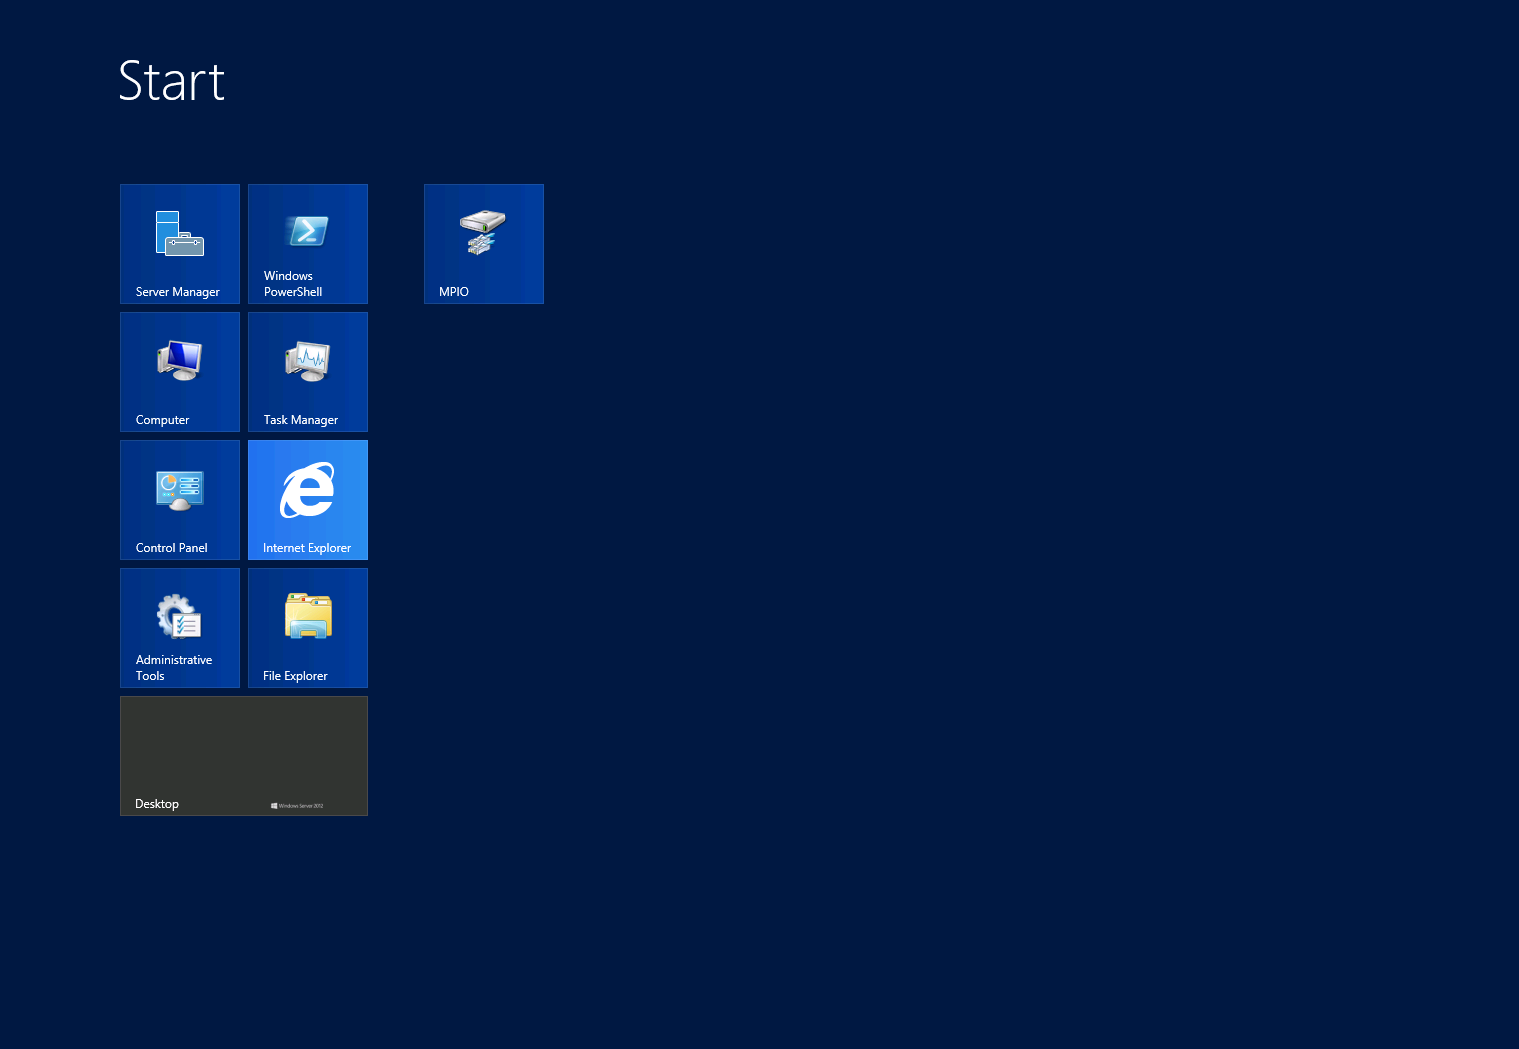 Microsoft Windows Server 2012 - Multipath IO Configuration - 11